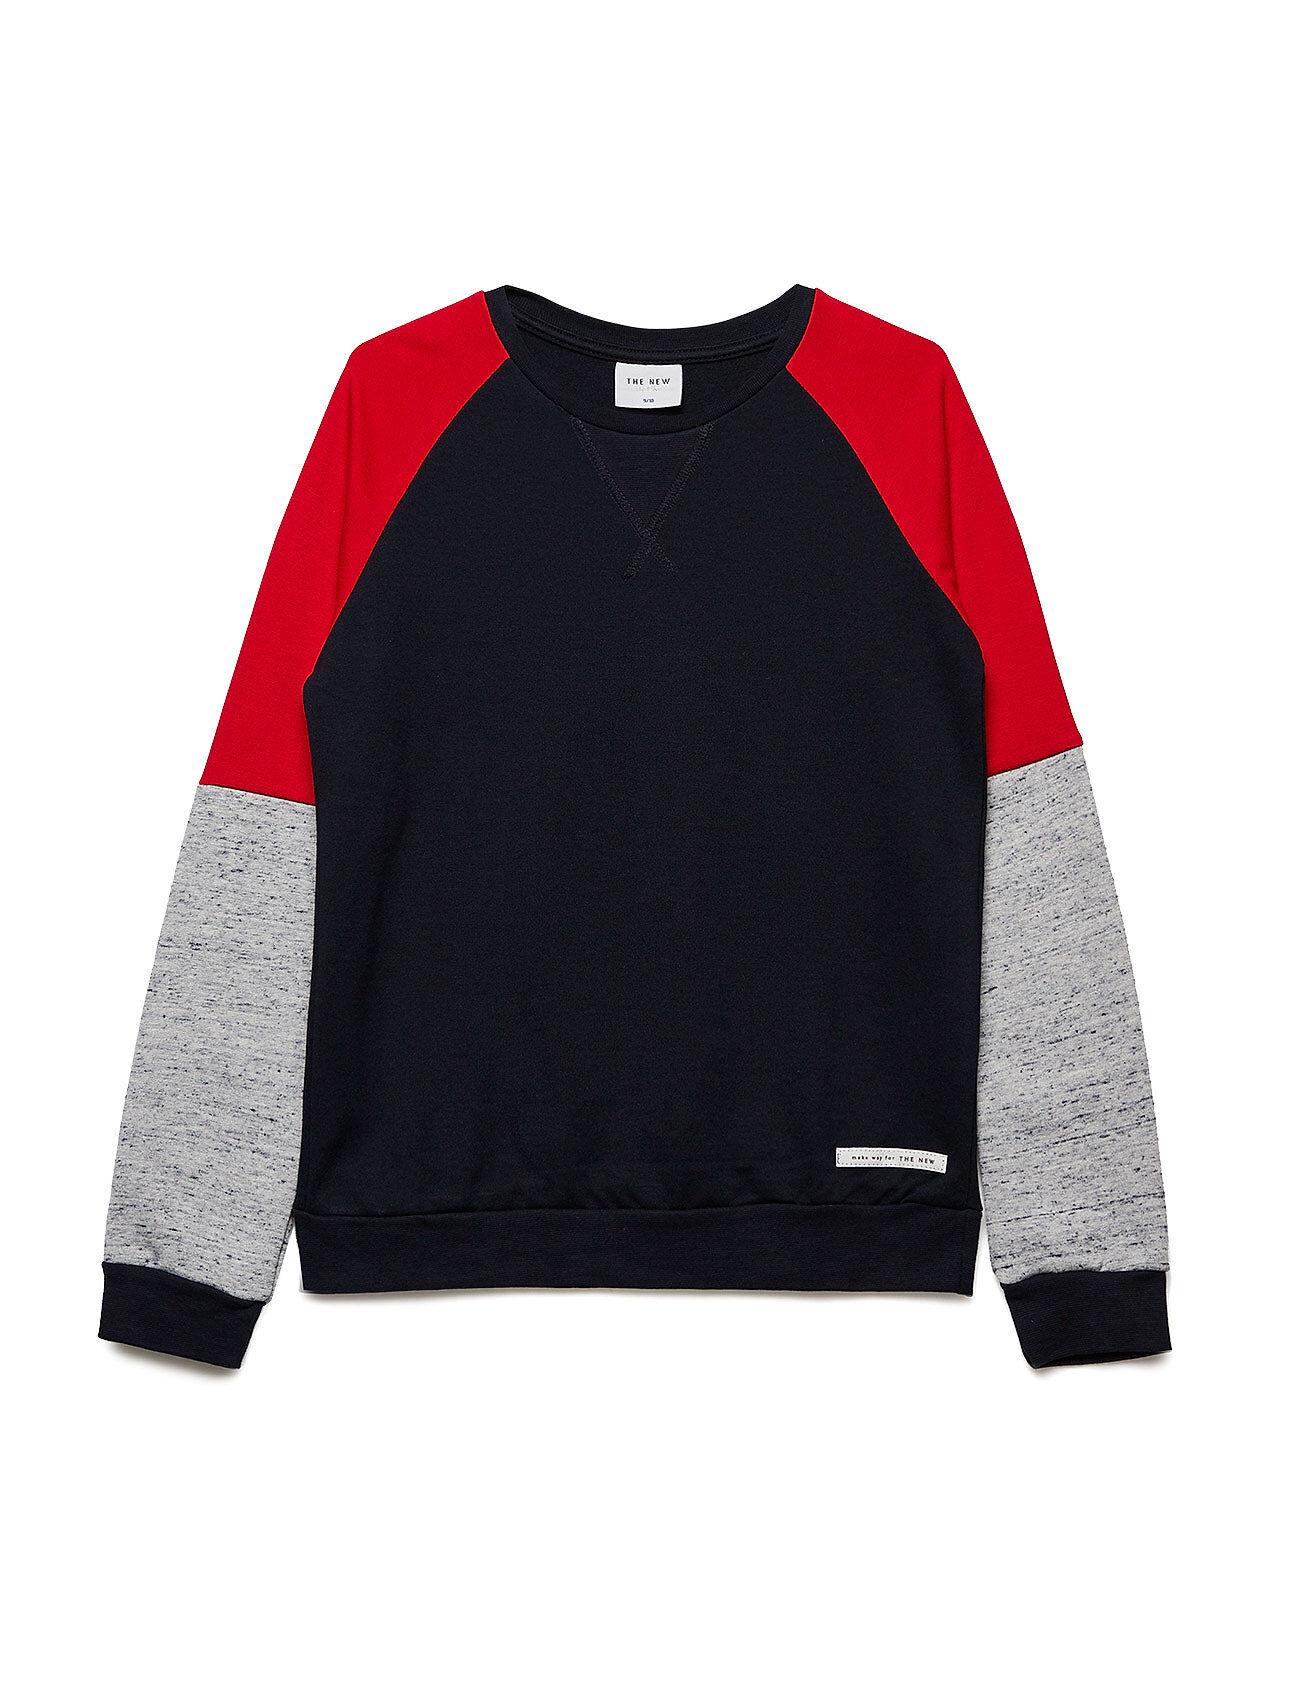 The New Iver Sweatshirt